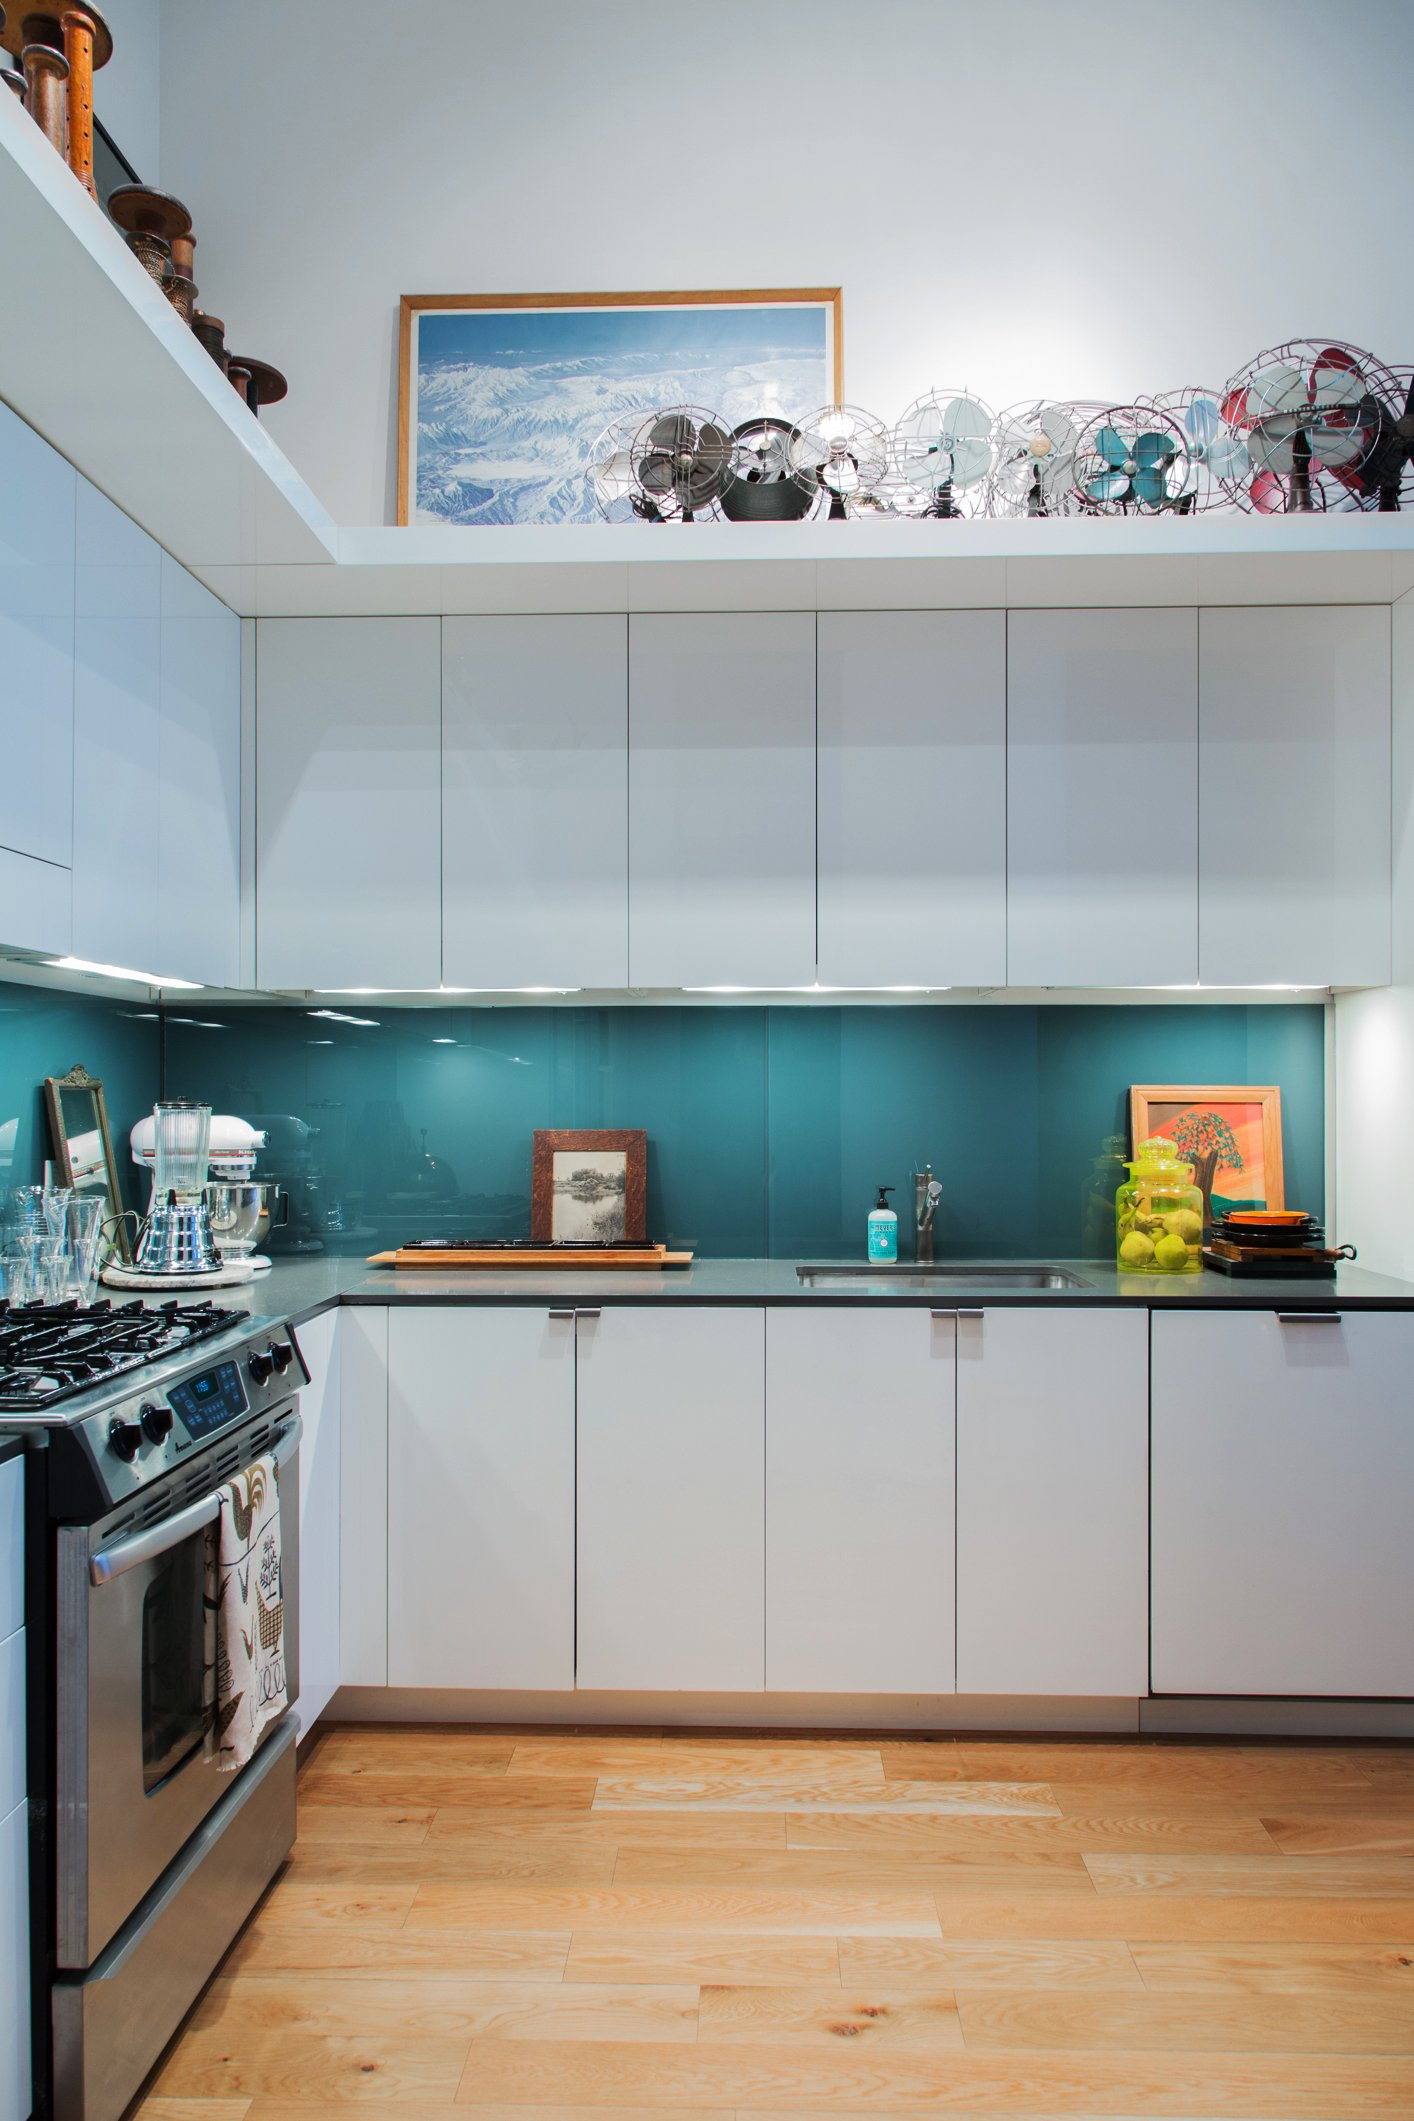 glass kitchen backsplash ideas tile